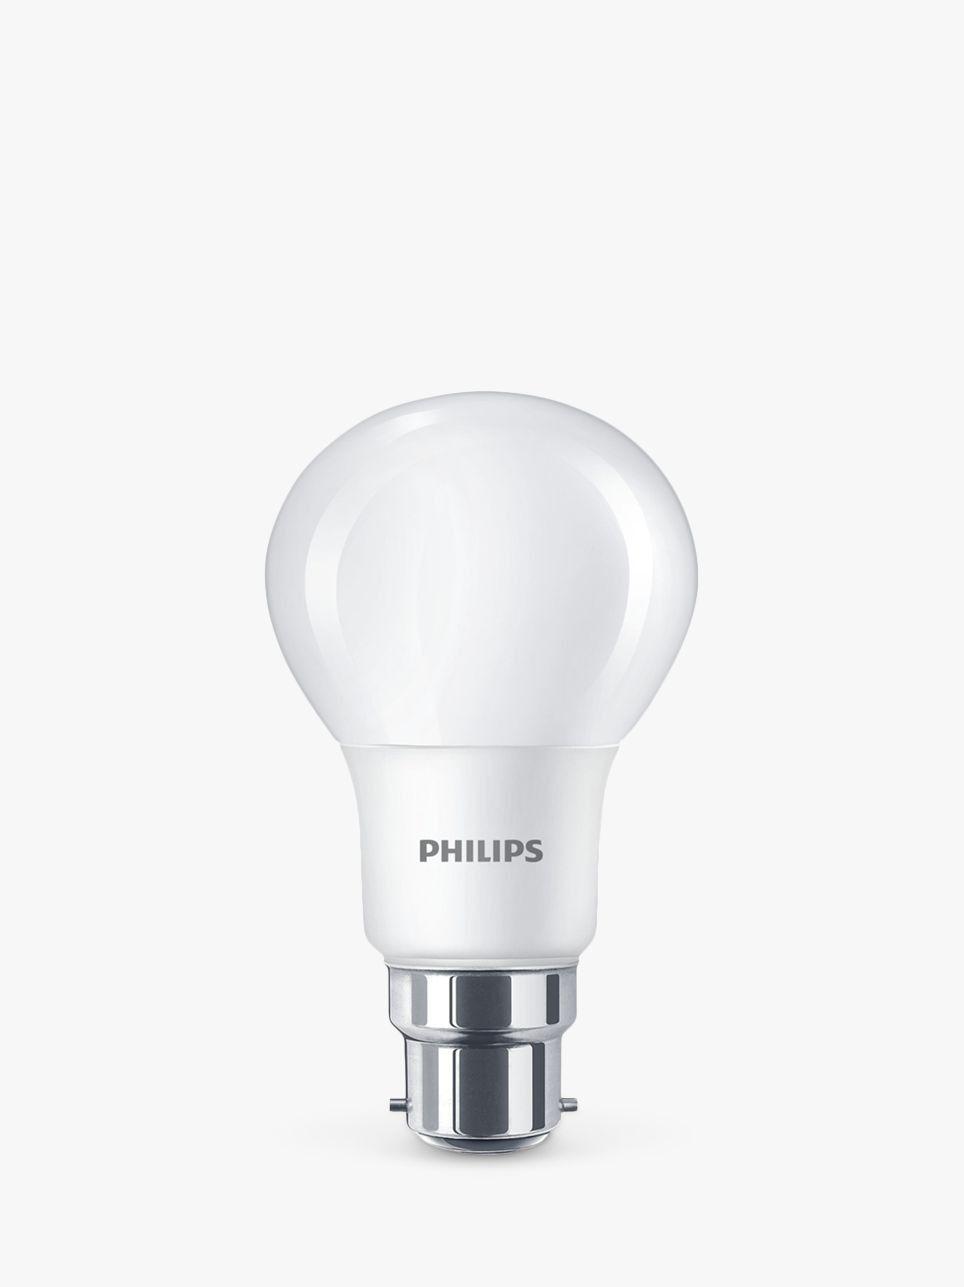 Philips 8w Bc Classic Led Warm White Light Bulb Pack Of 6 White Light Bulbs Light Bulb White Light